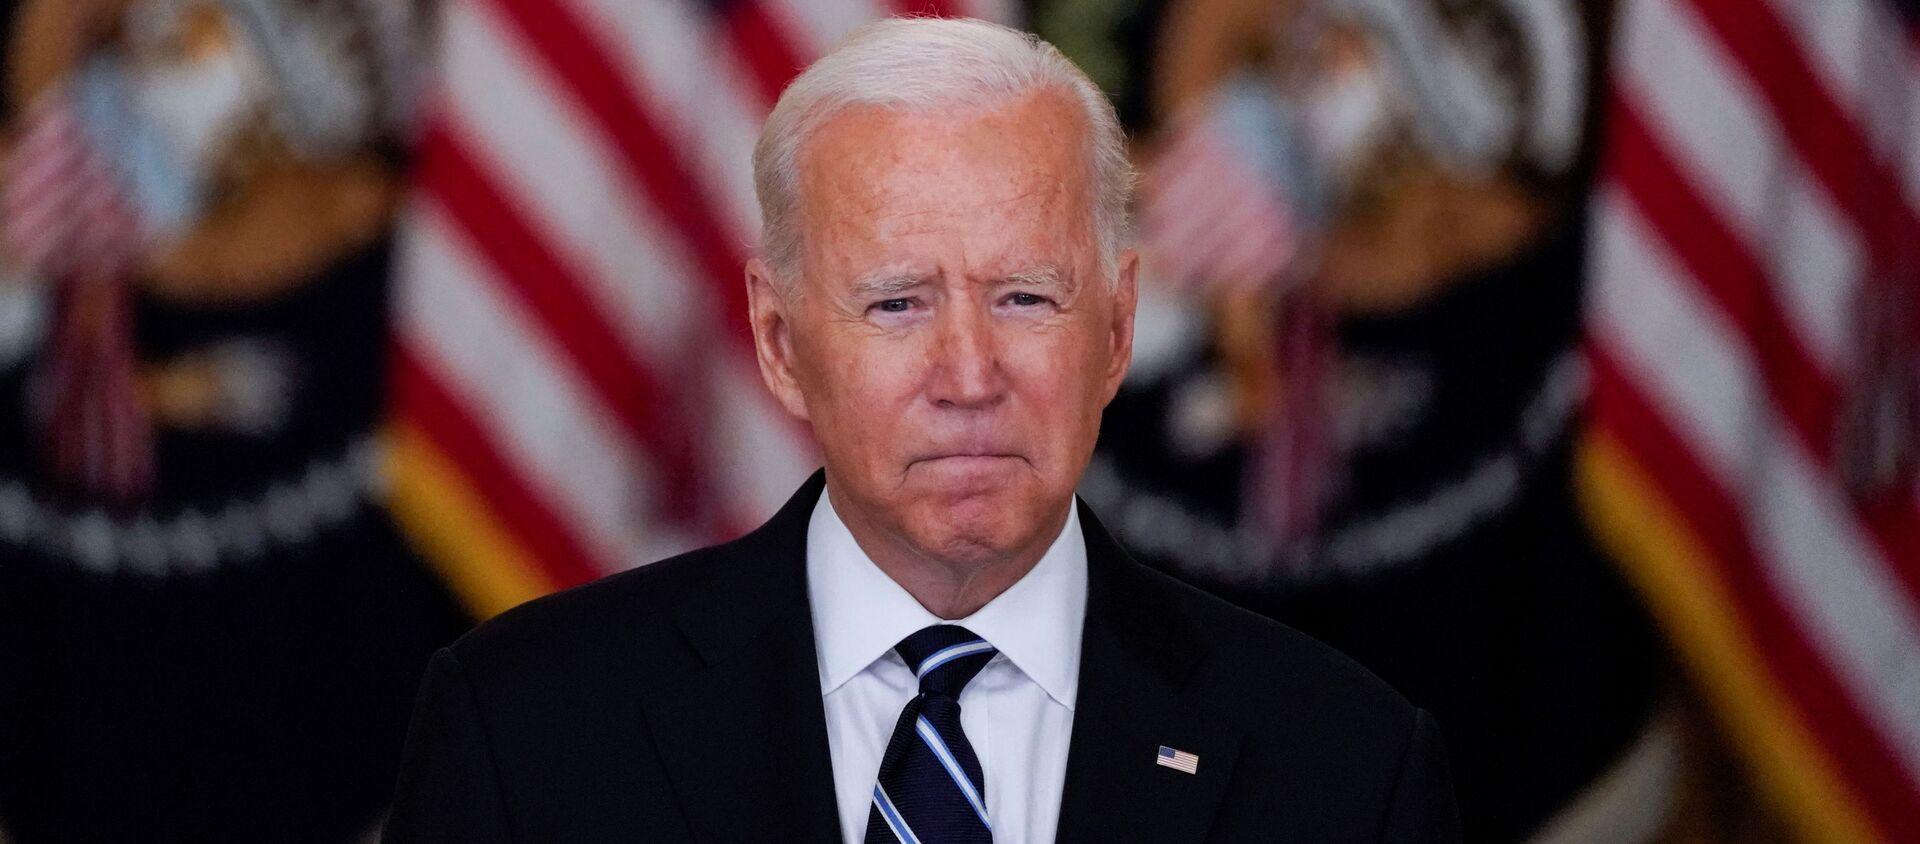 US President Biden speaks about the coronavirus response and vaccination programme at the White House in Washington - Sputnik International, 1920, 21.08.2021